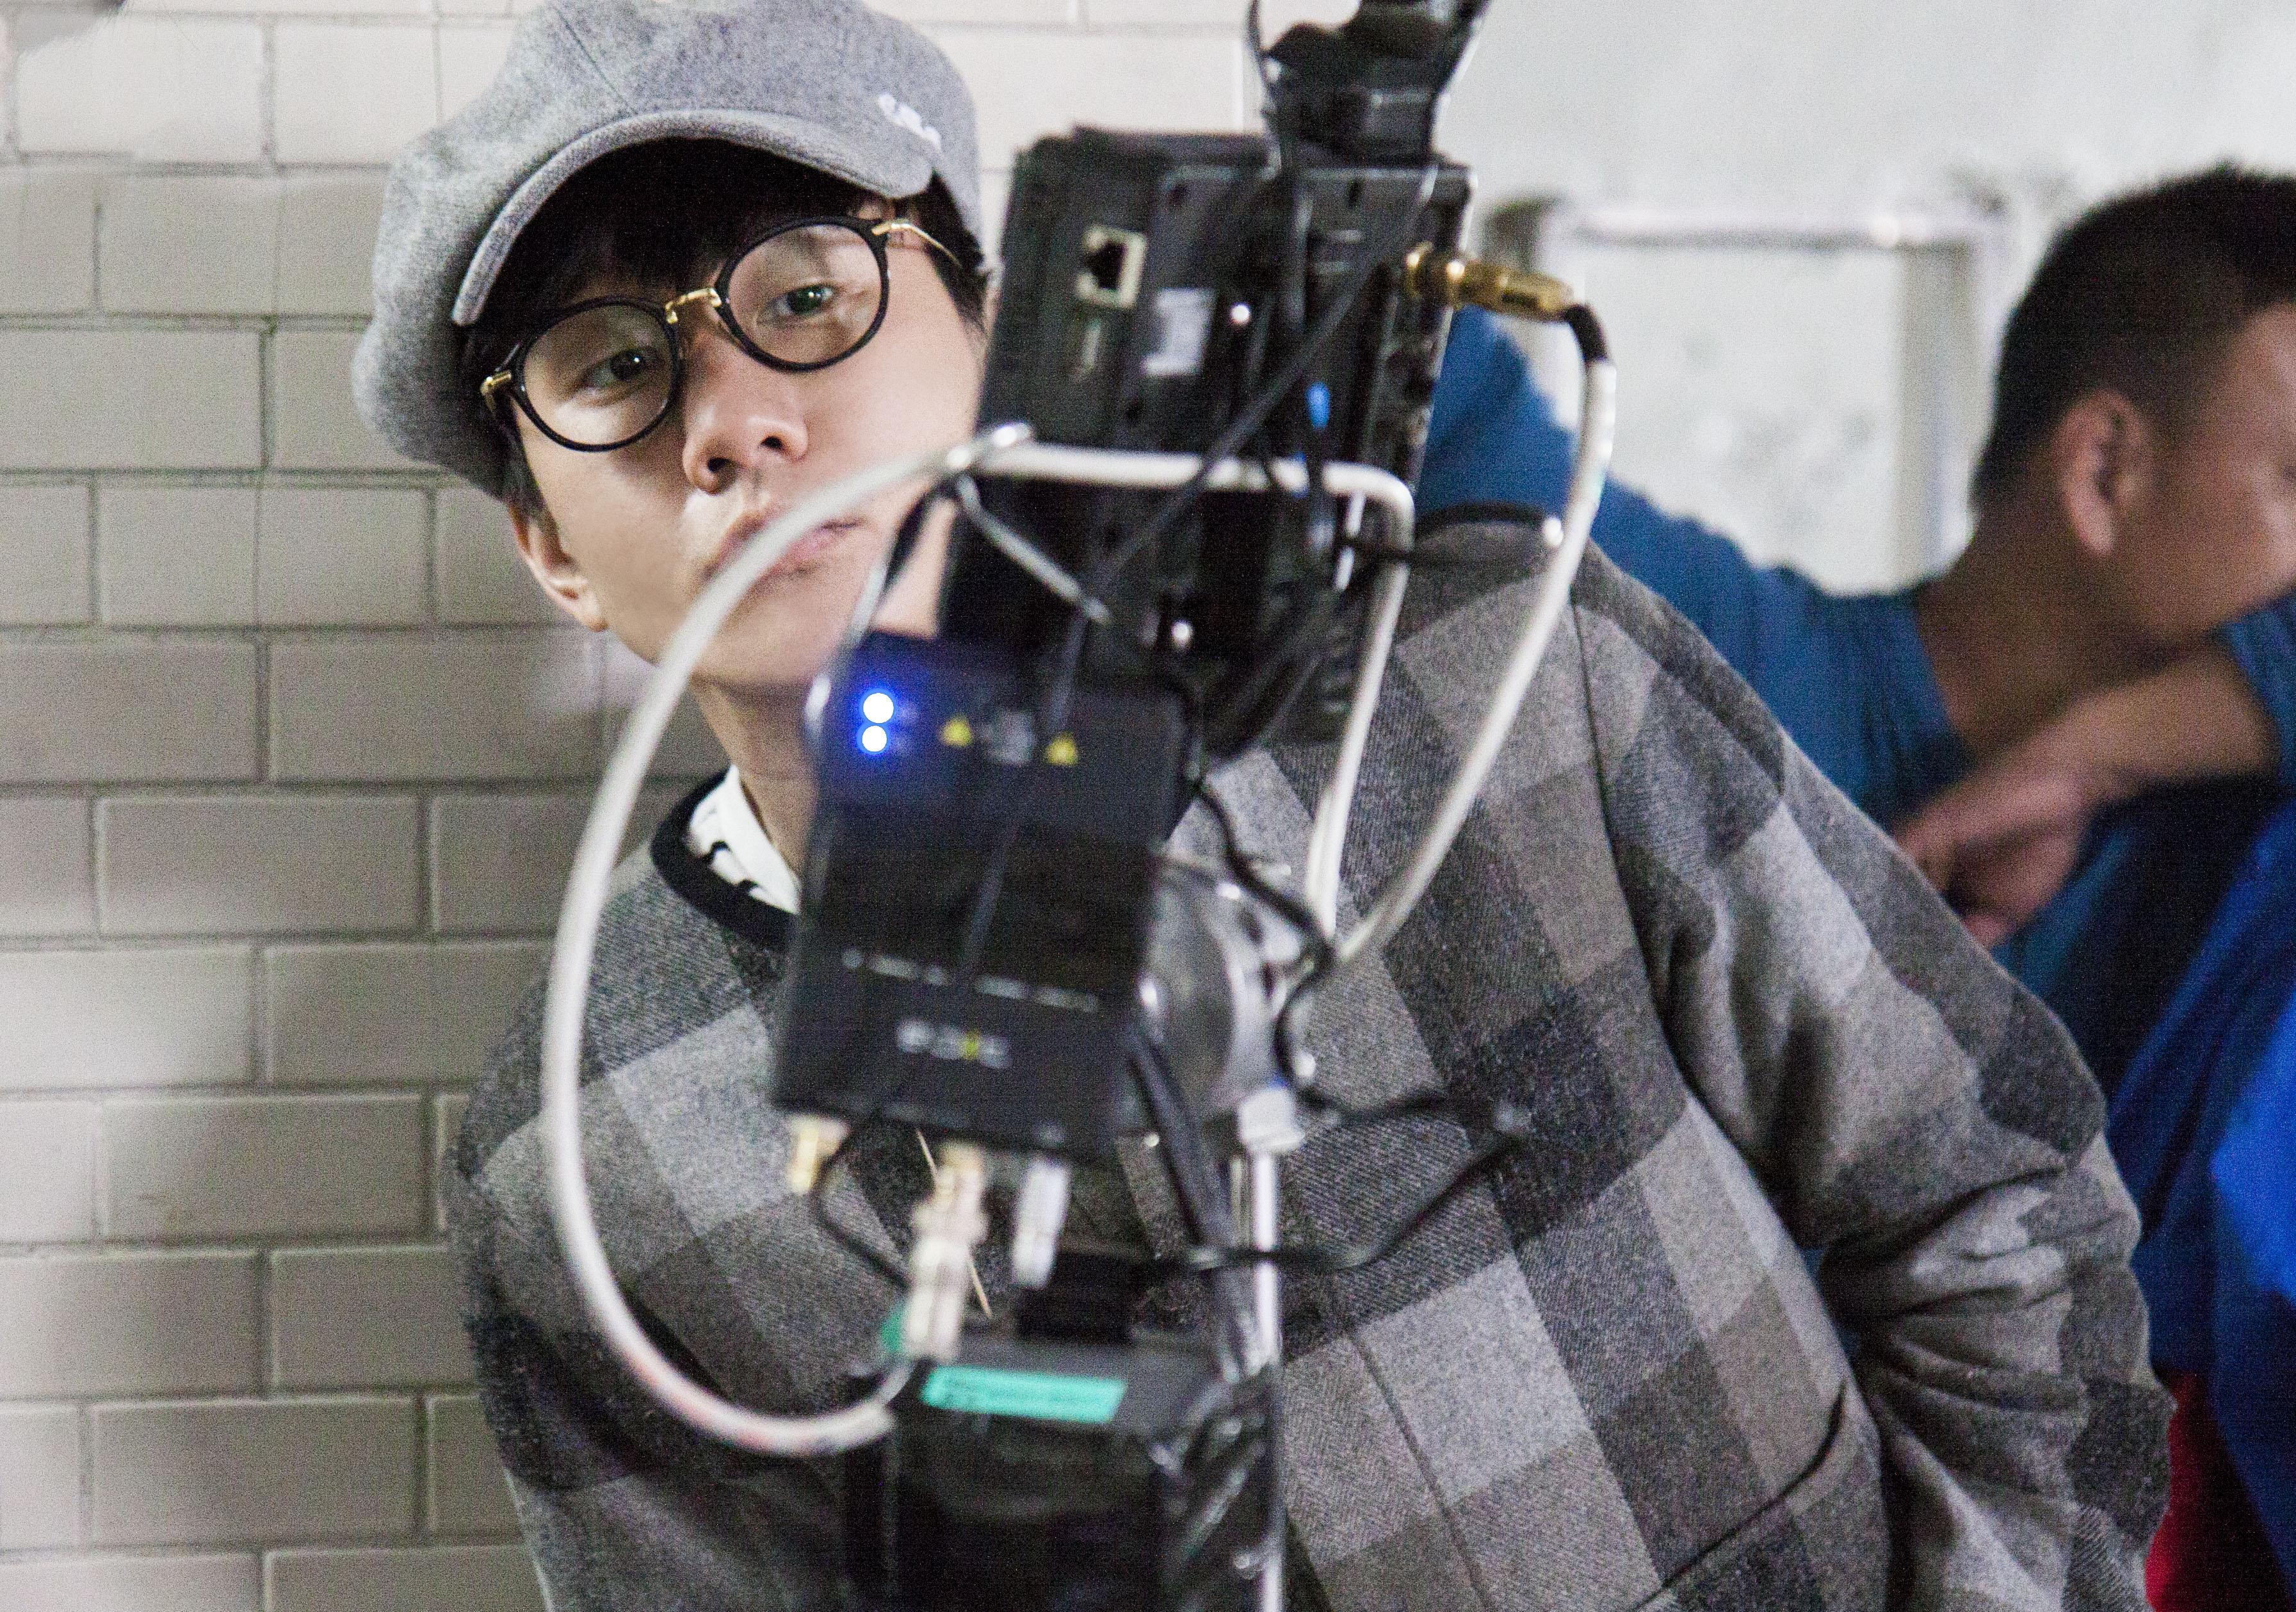 JJ林俊傑《和自己對話》首執導演筒_邀好友及音樂製作助理演出〈有夢不難〉MV05.jpg